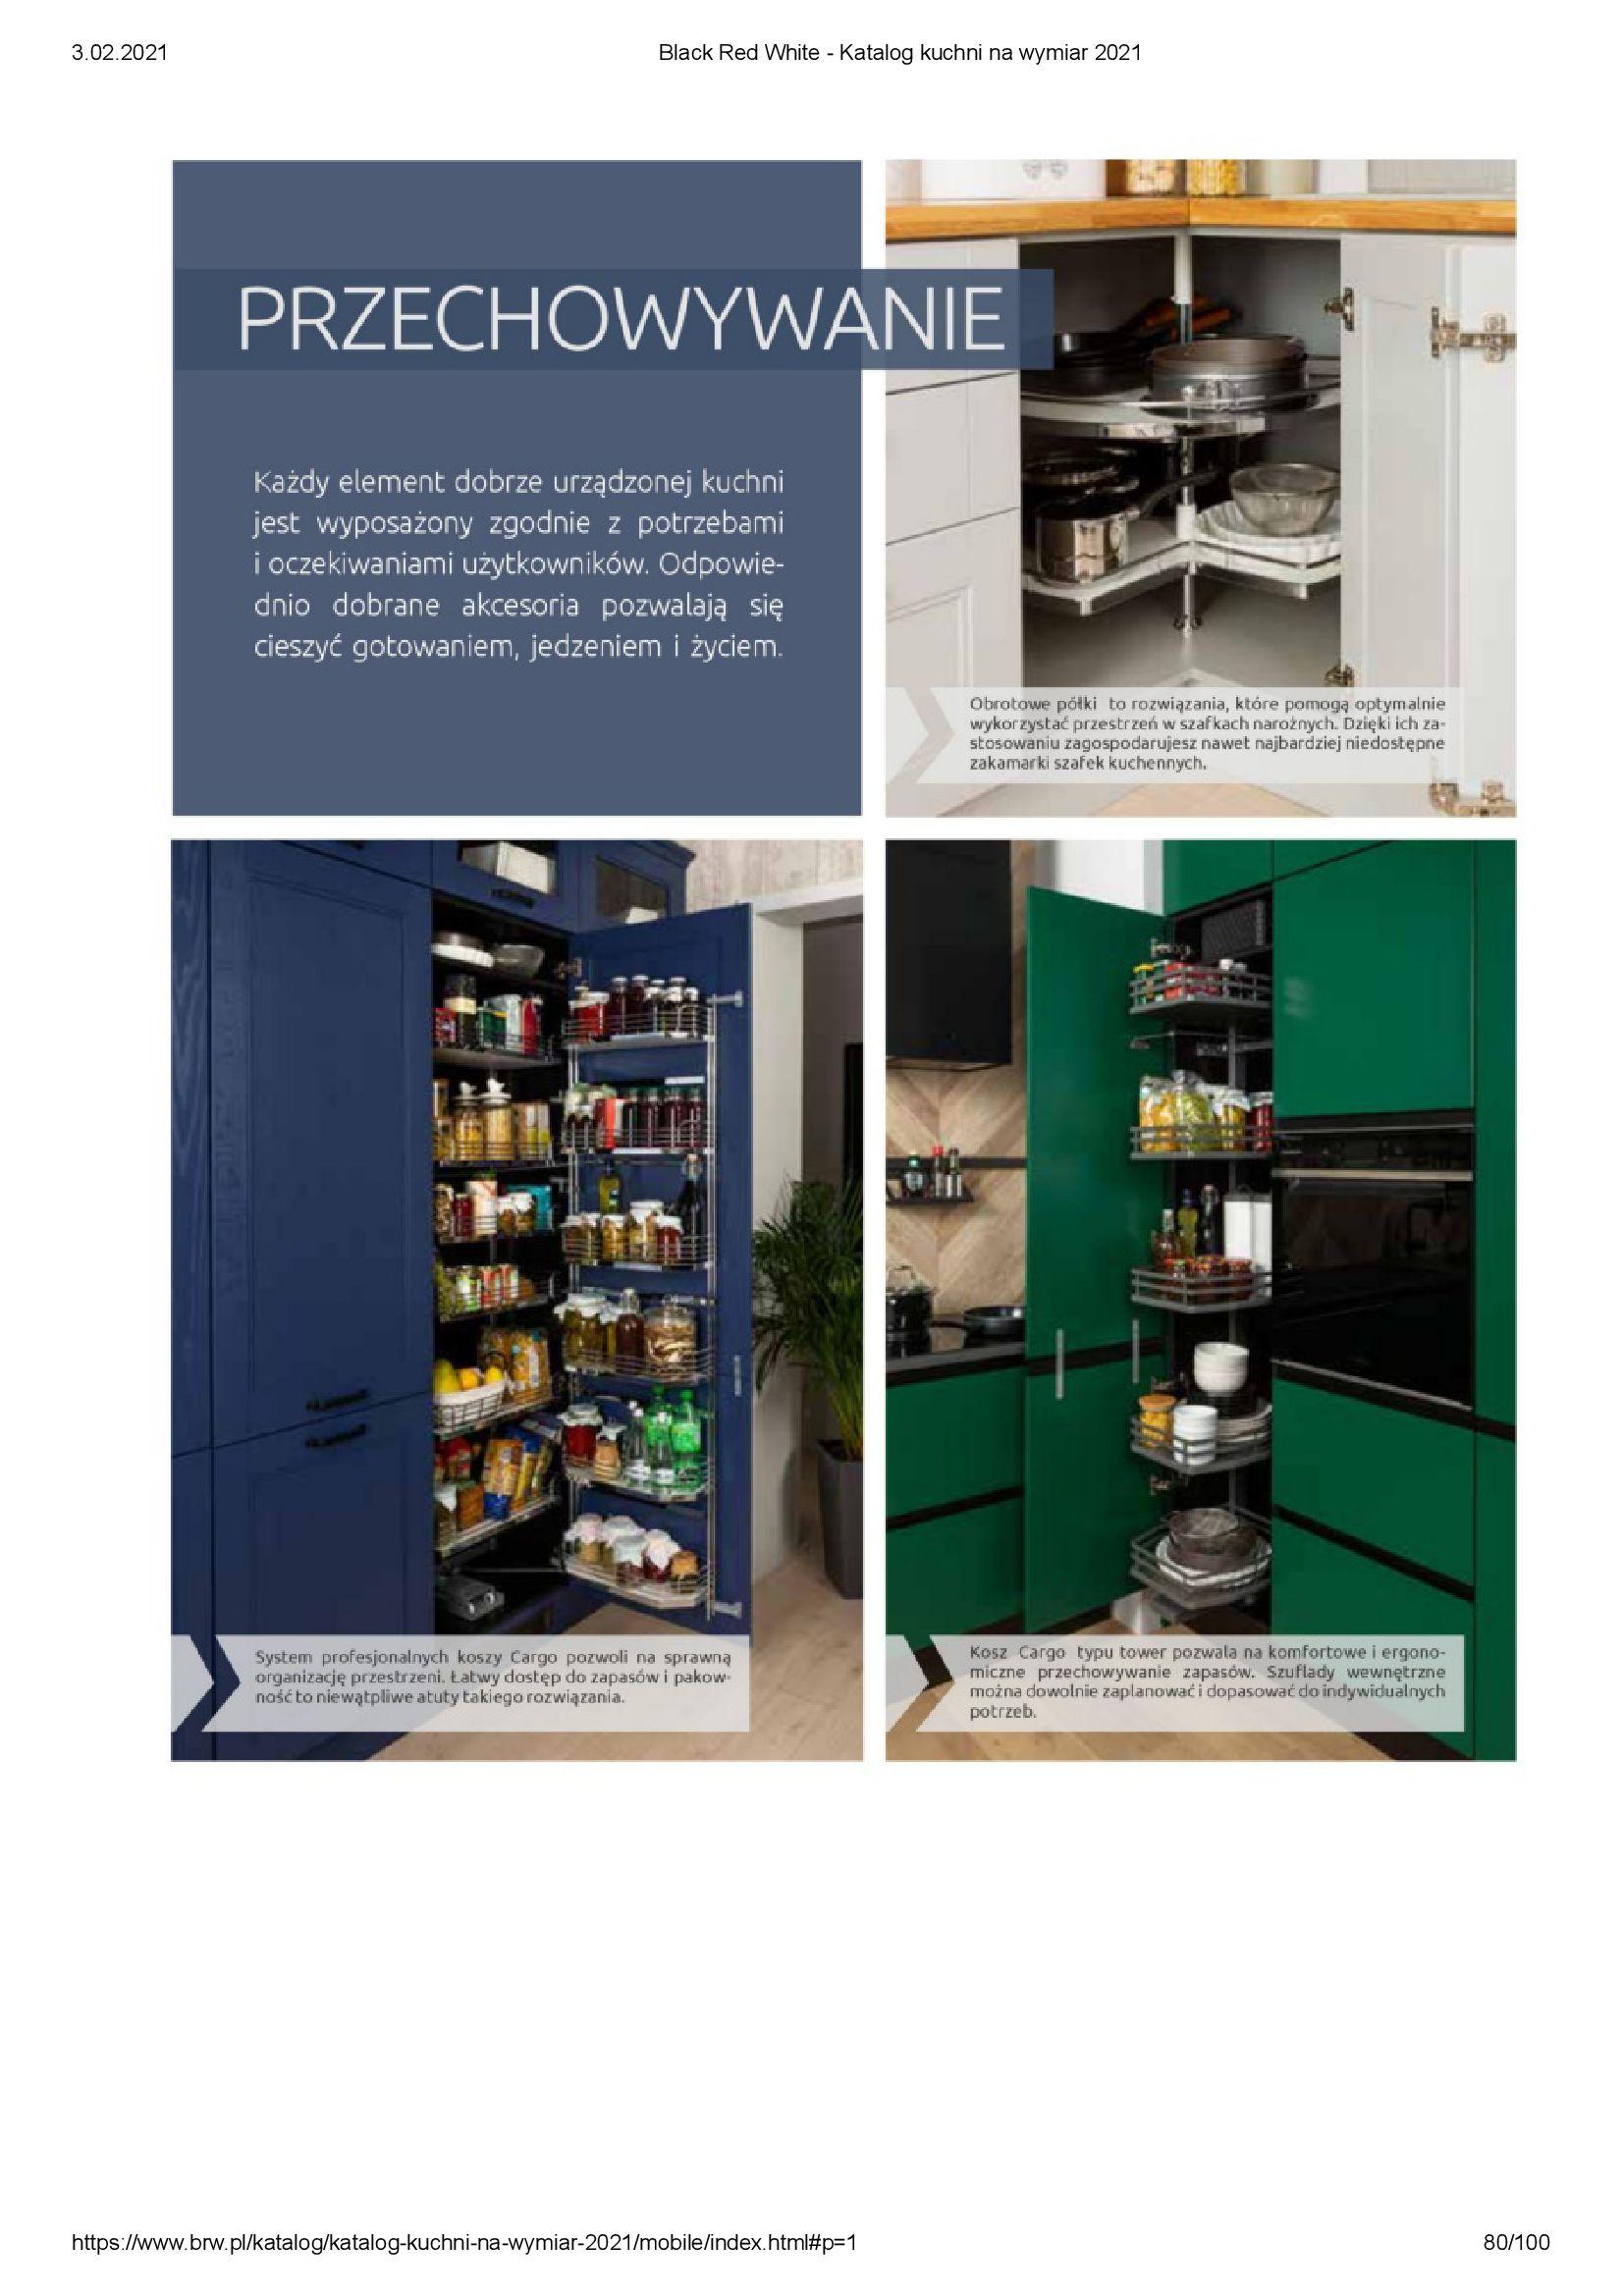 Gazetka Black Red White: Katalog - Kuchnie na wymiar Senso Kitchens 2021 2021-01-01 page-80